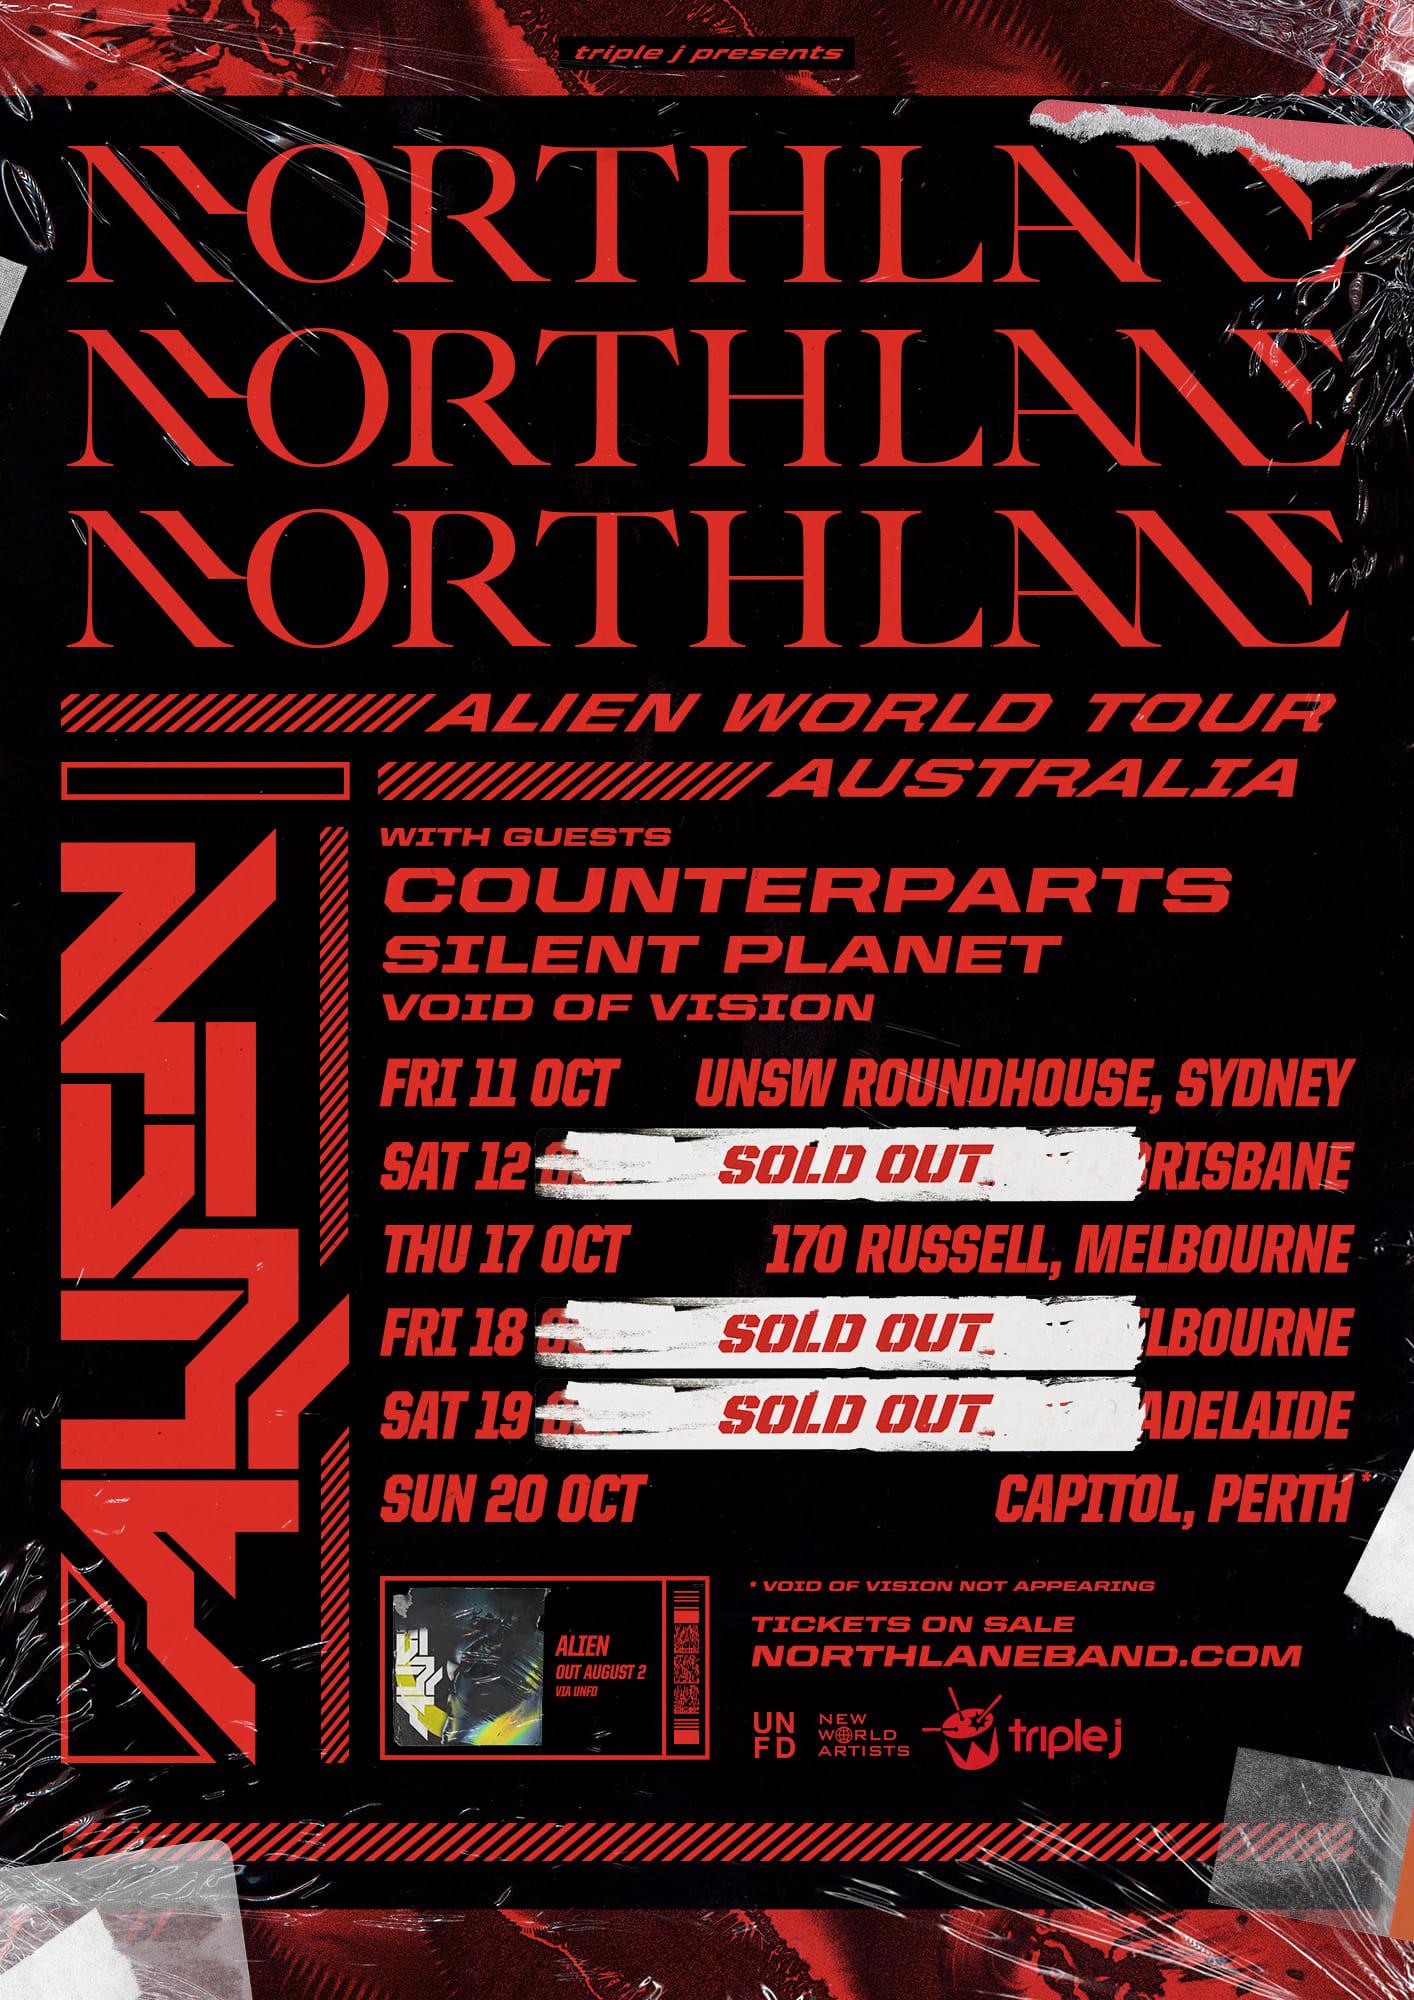 northlane aus tour